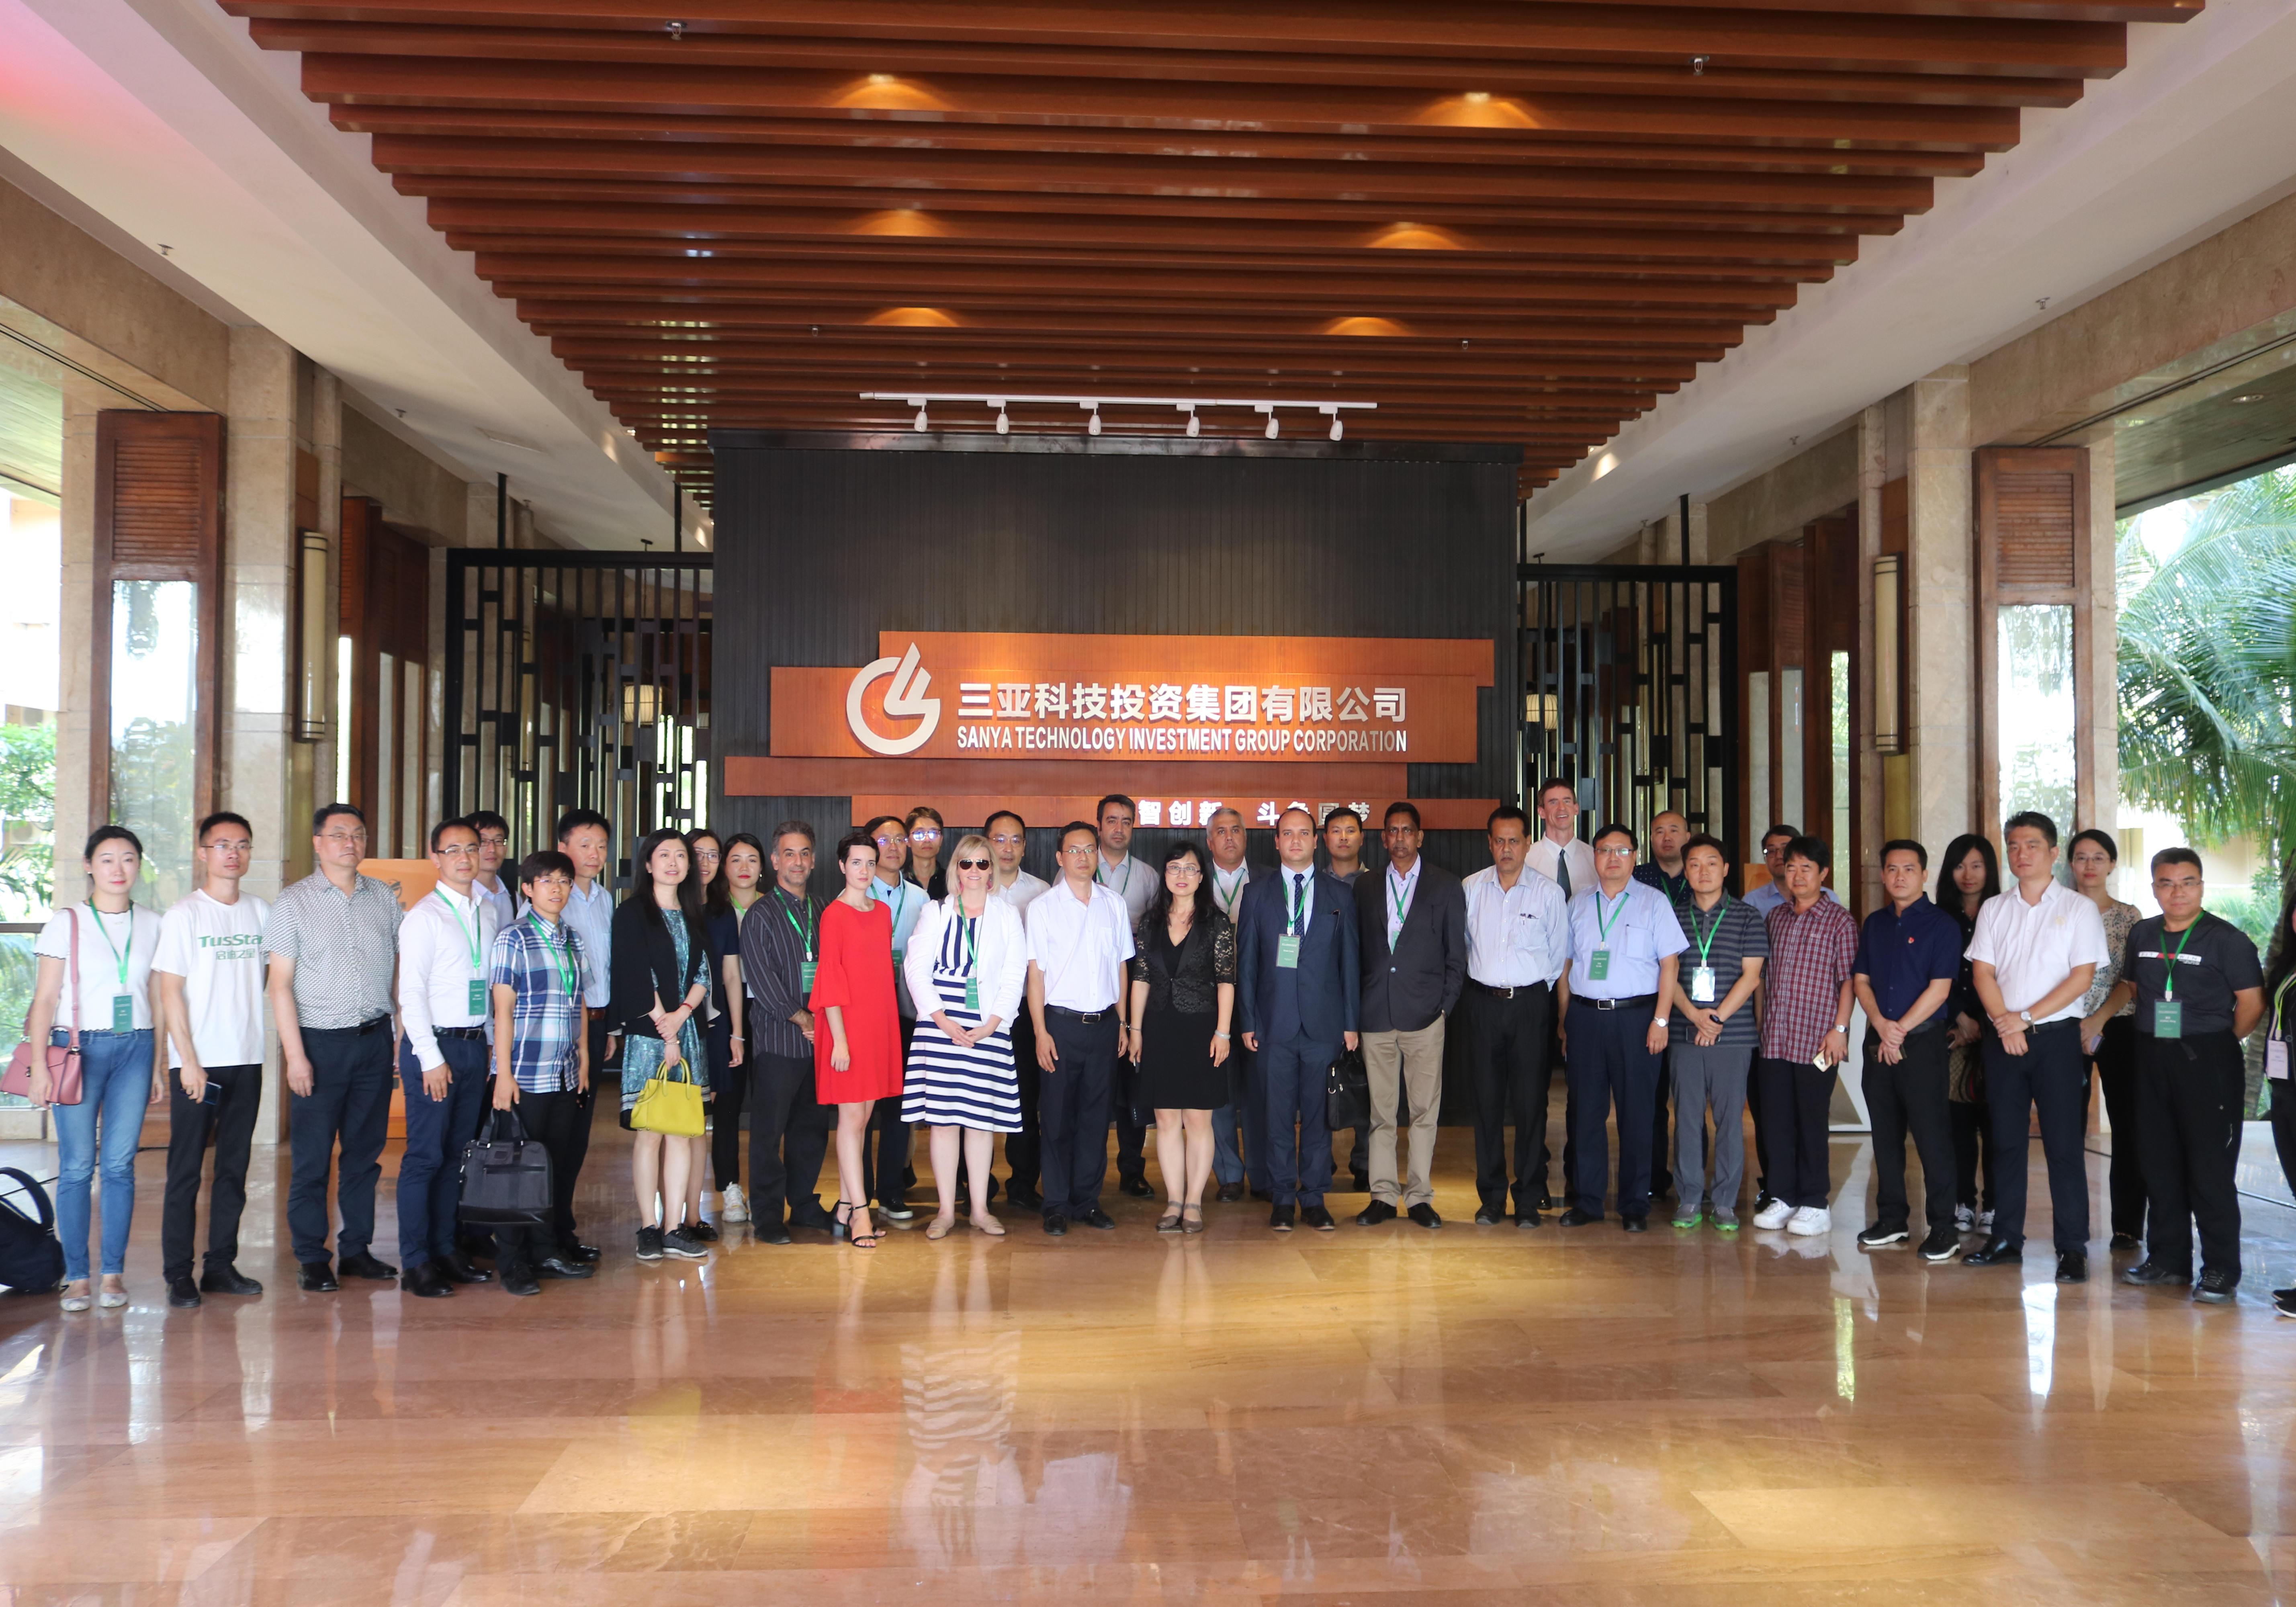 G20二十国集团创业圆桌会议各国代表赴科投集团参观考察